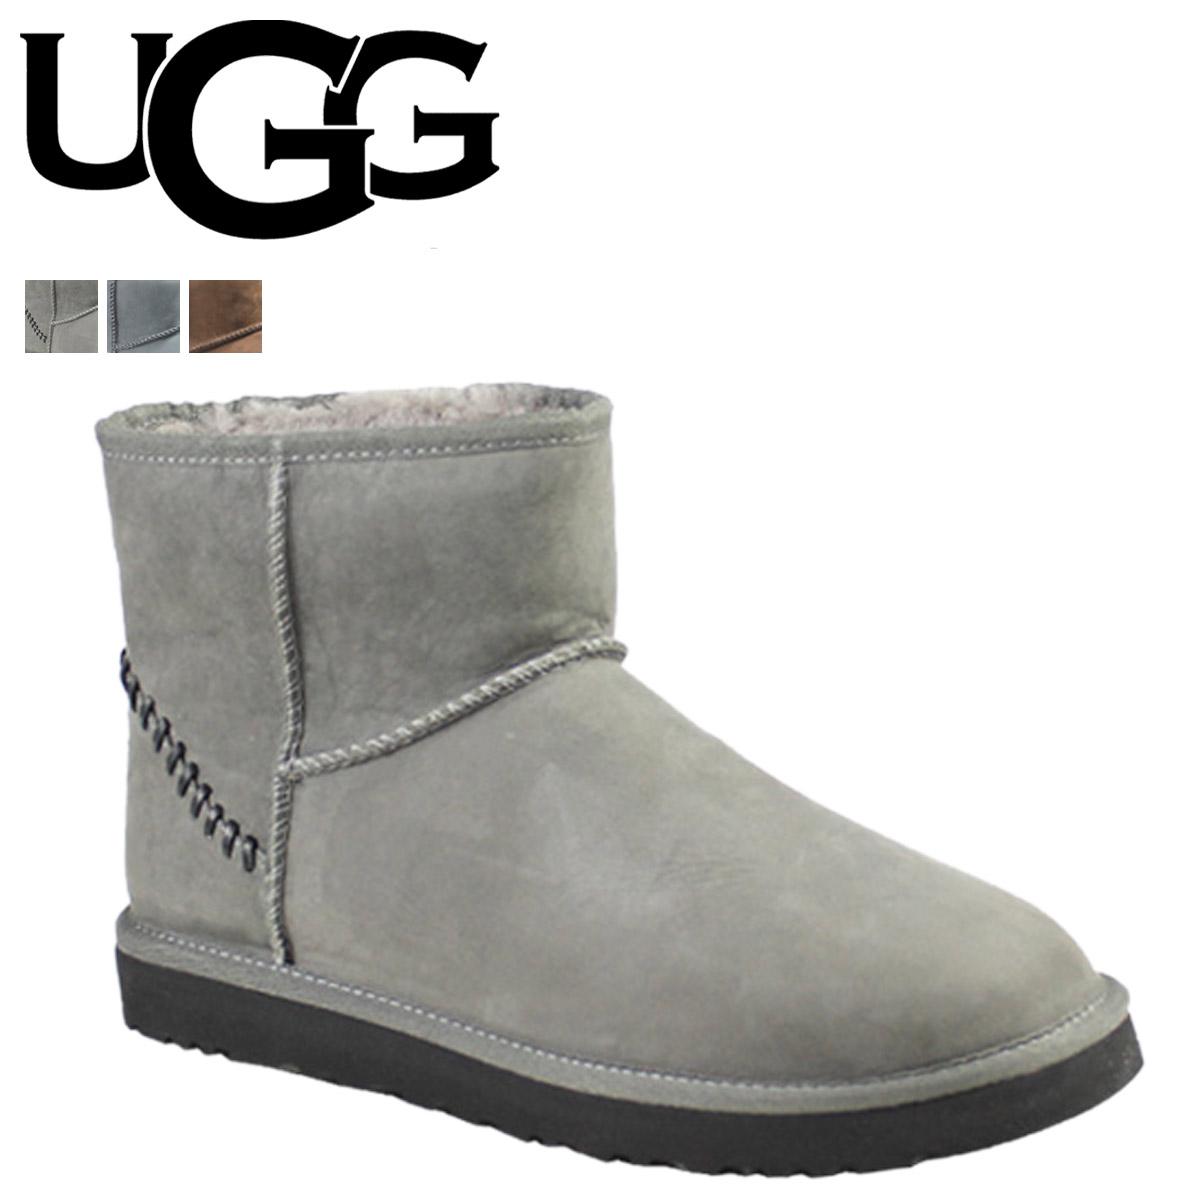 14faa6451b8 UGG UGG men's classic mini Sheepskin boots MENS CLASSIC MINI DECO 1006523  Sheepskin